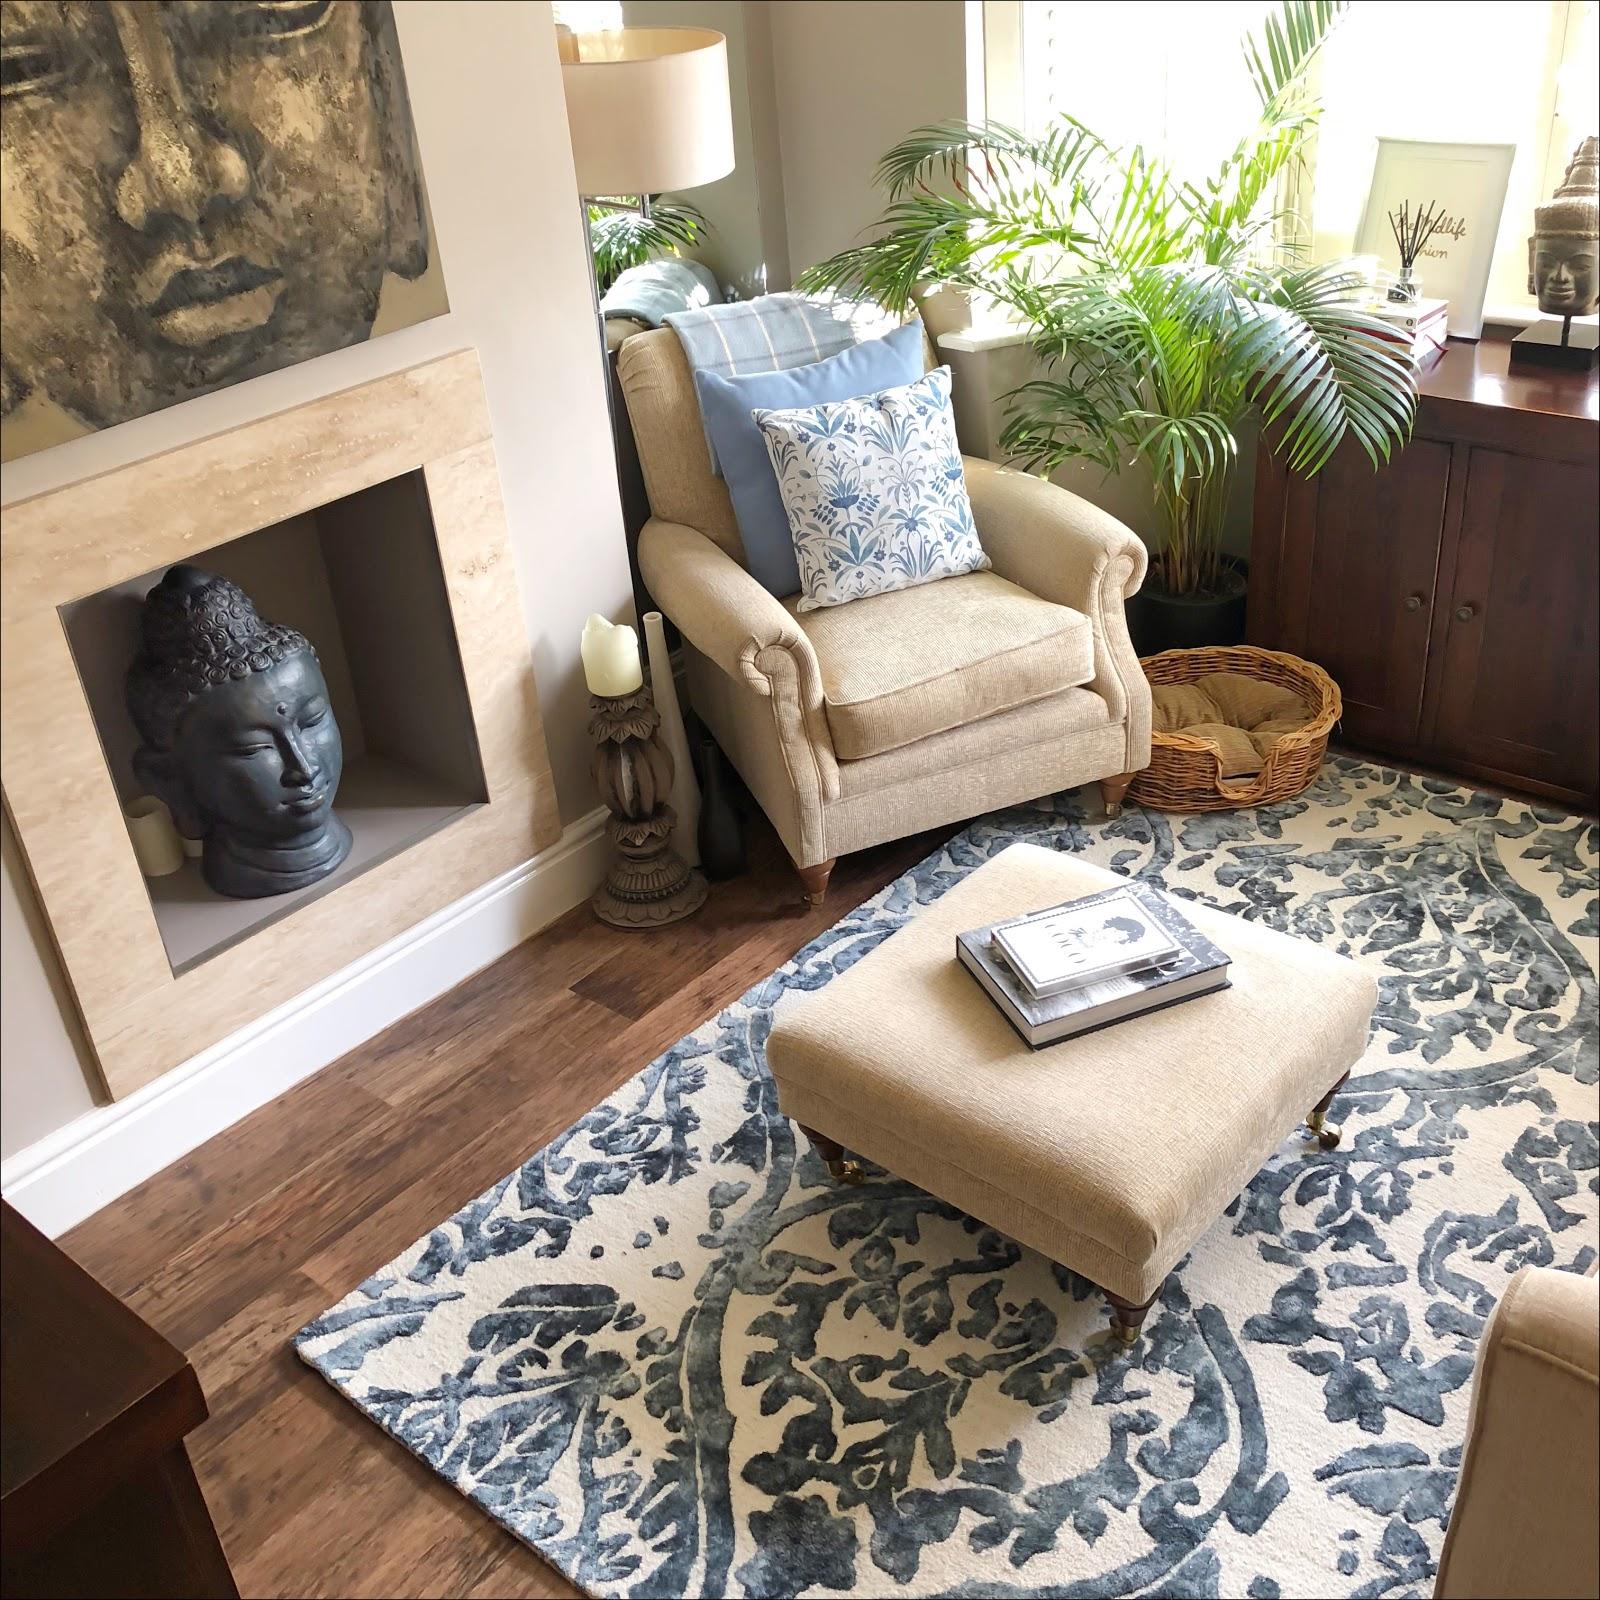 homeware at marks spencer wiw my midlife fashion. Black Bedroom Furniture Sets. Home Design Ideas